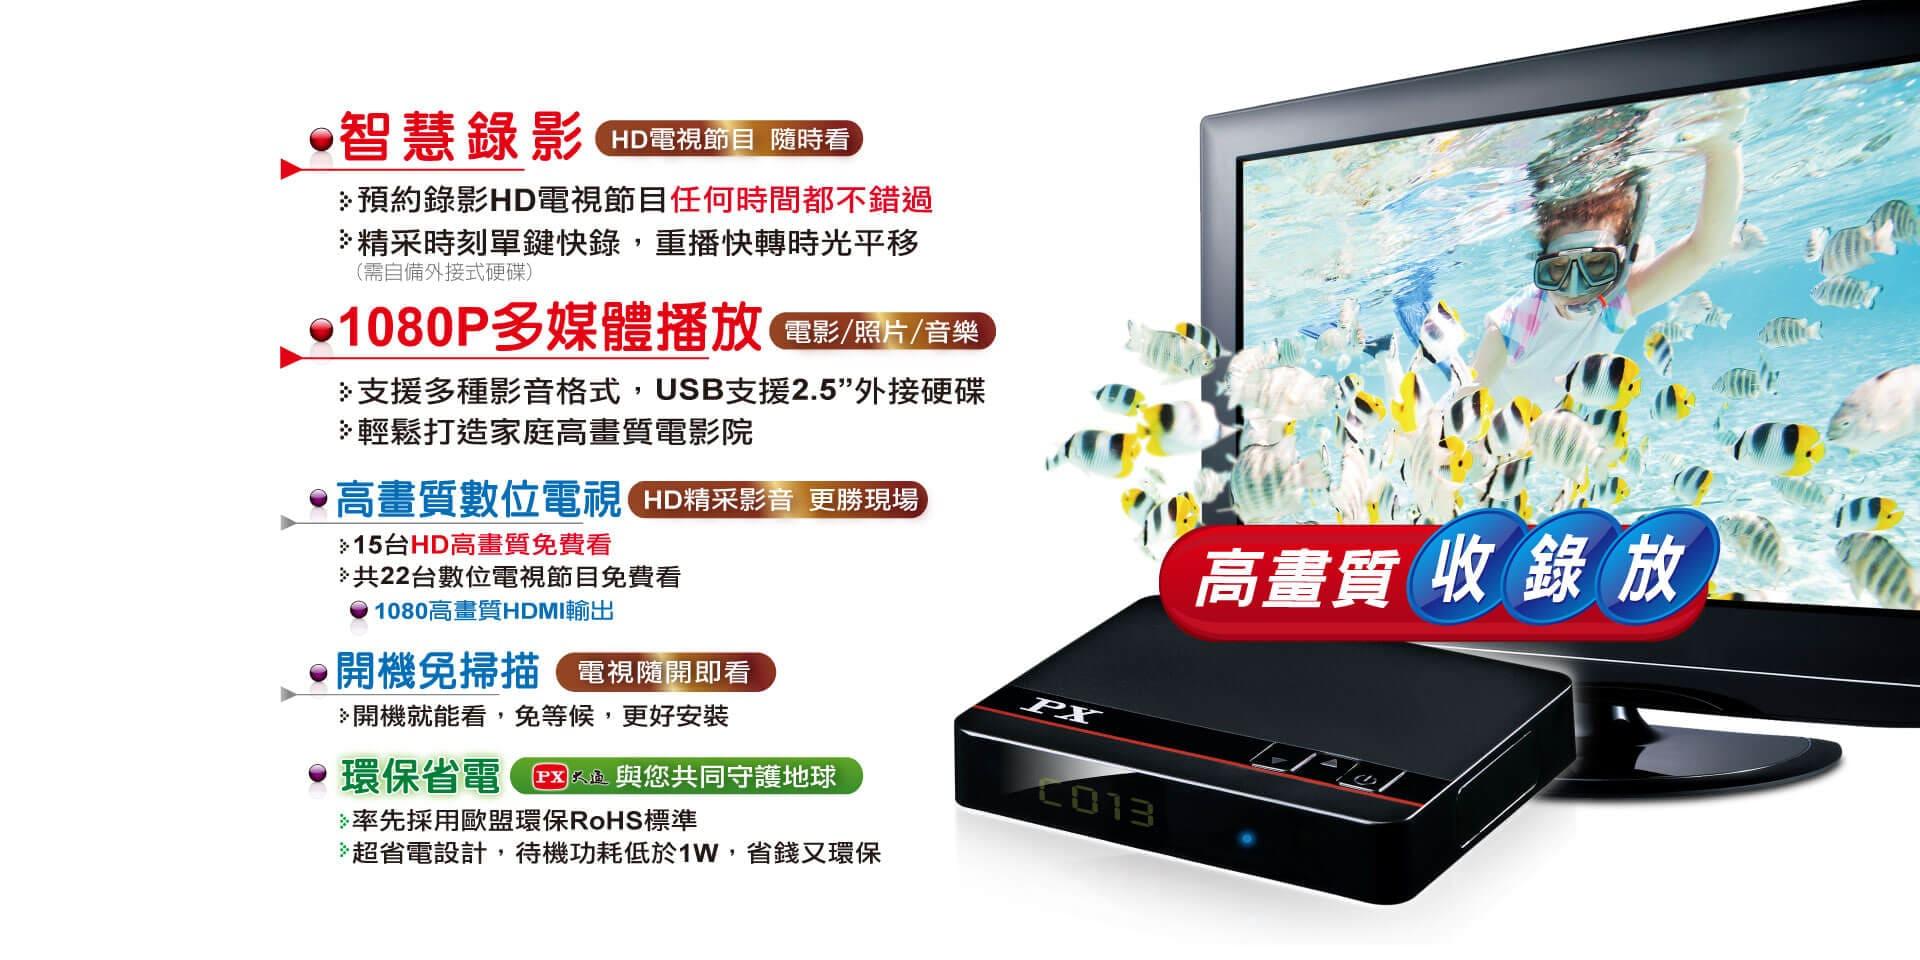 proimages/product/STB機上盒/HDP-805/HDP-805-02.jpg